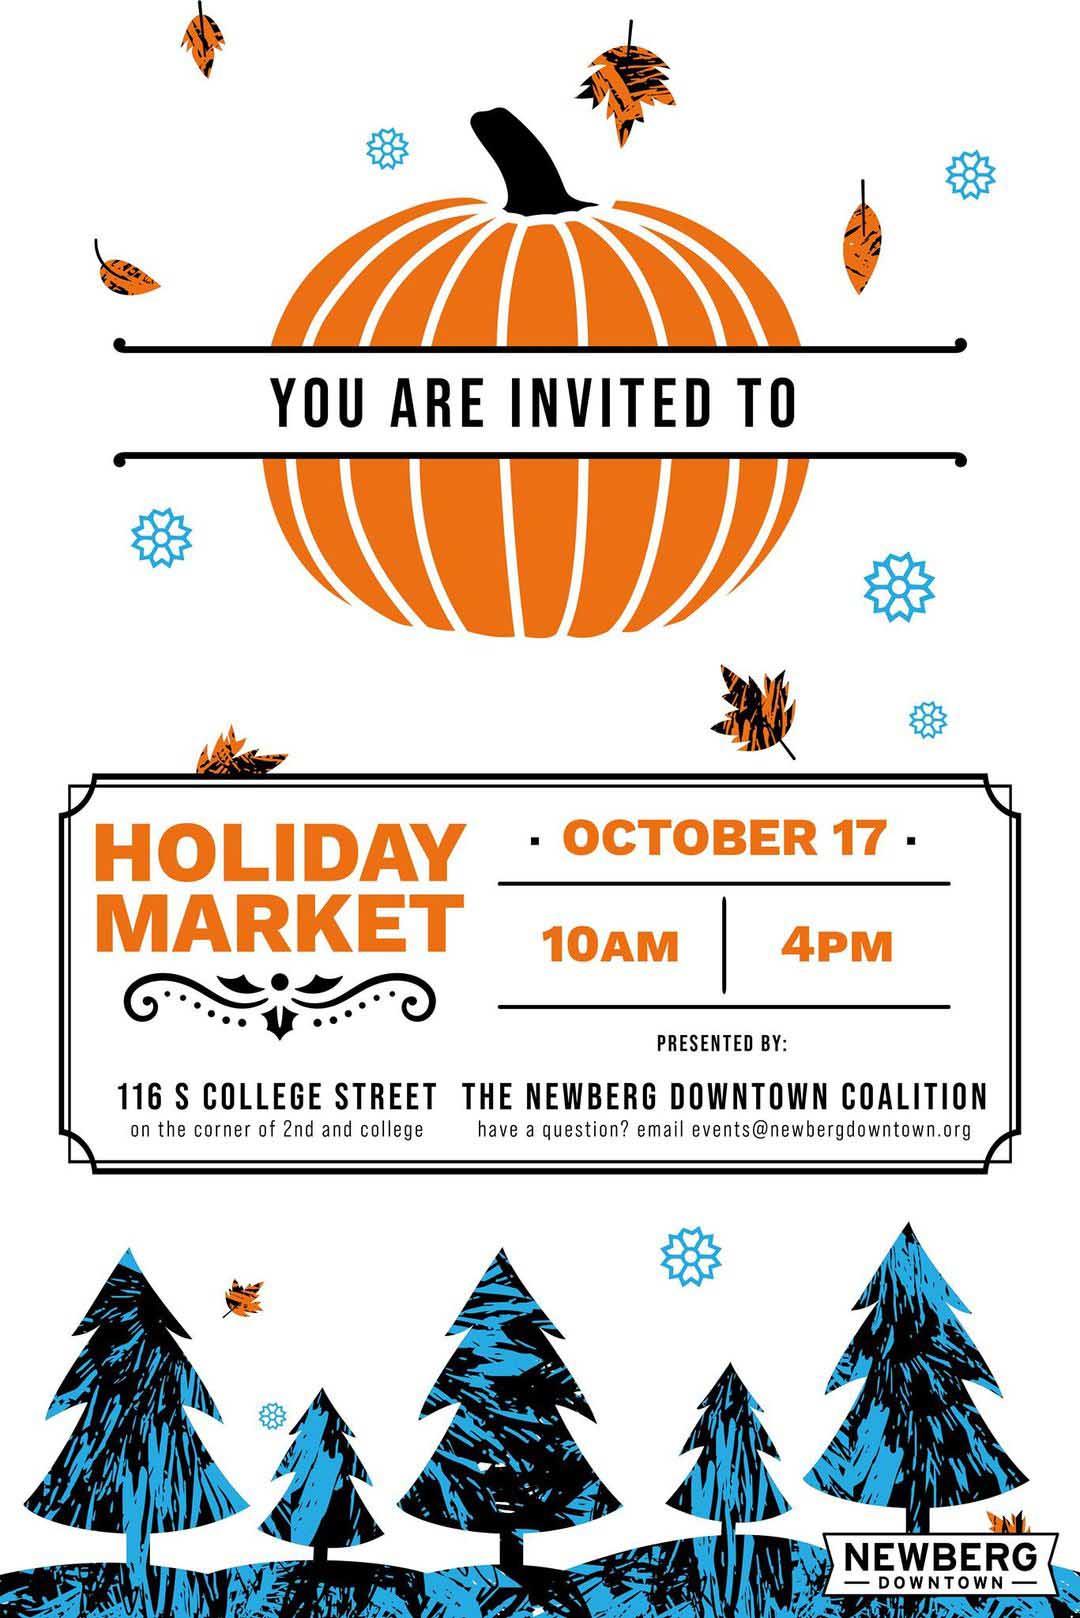 Newberg Holiday Market